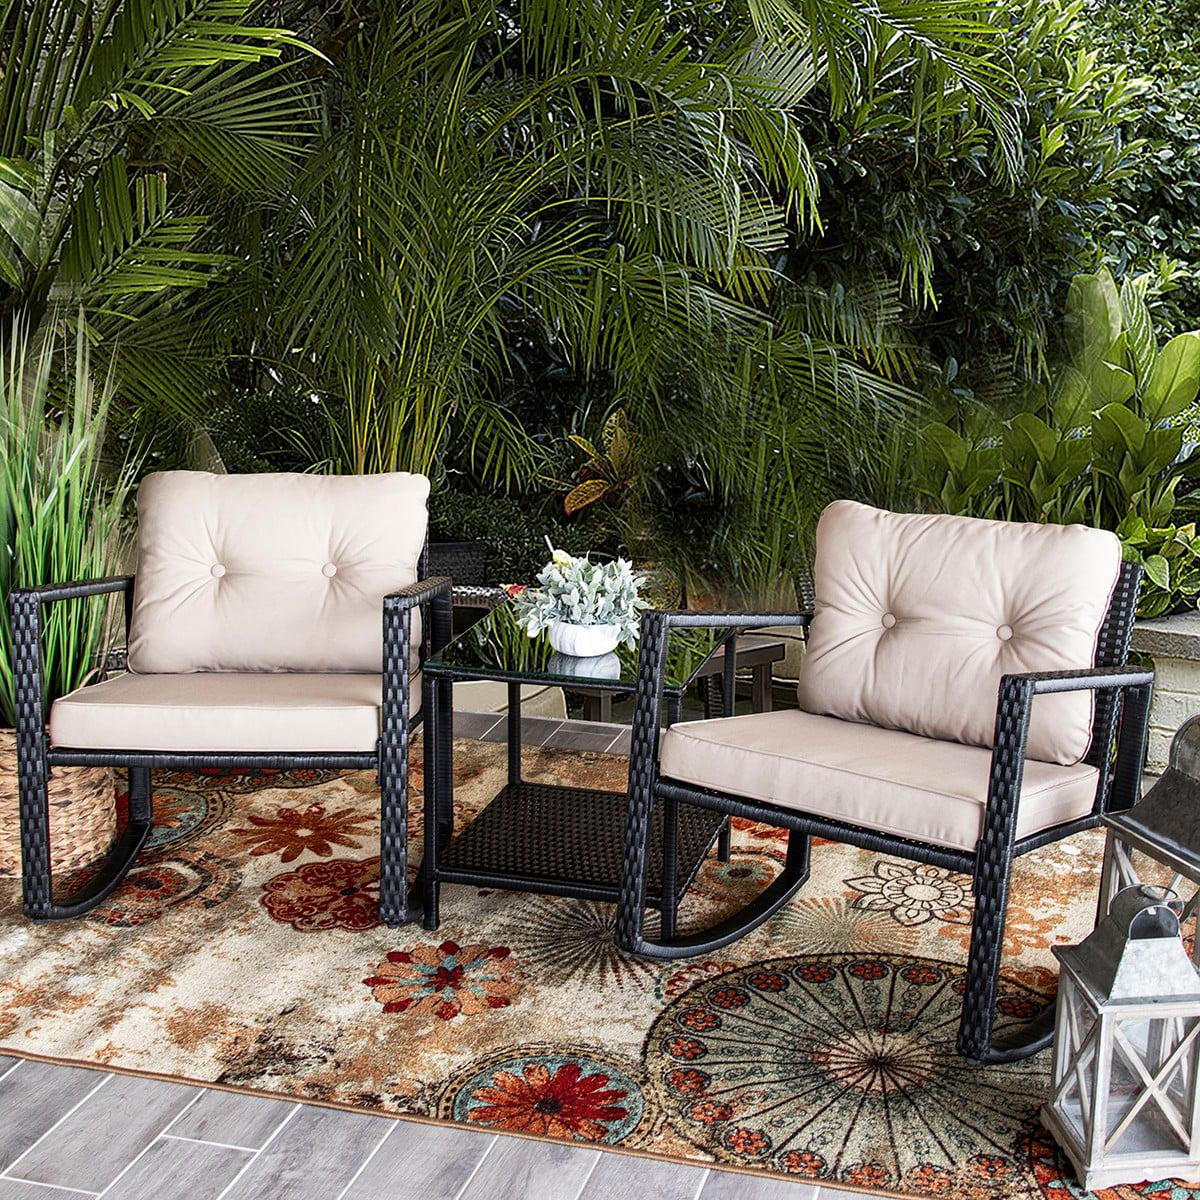 barton 3pc patio set chair wicker rattan outdoor rocking chair cushion glass coffee table set